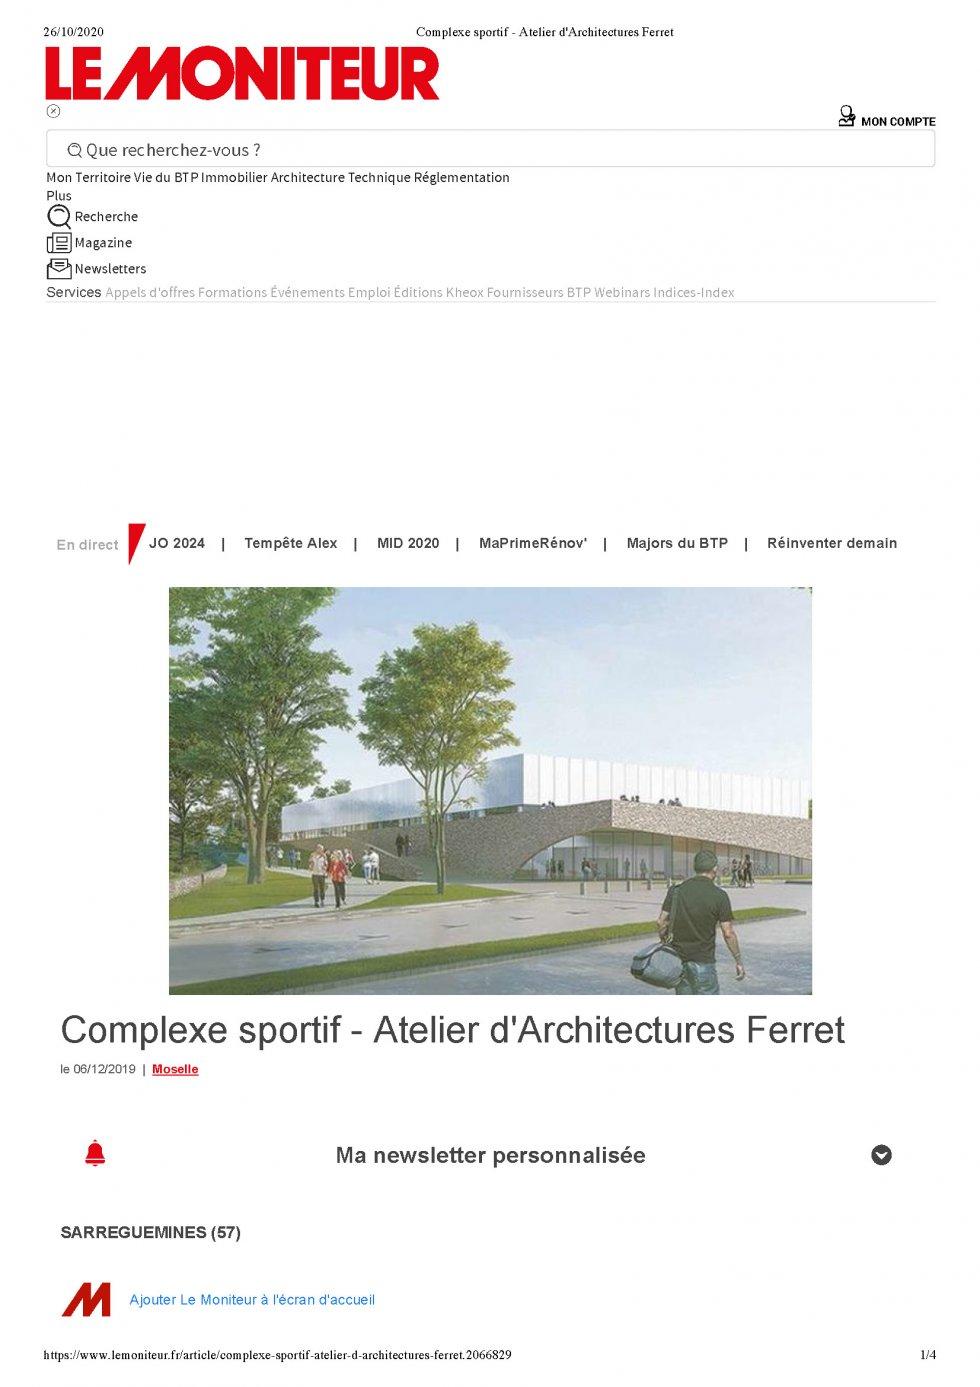 Sports Center – Sarreguemines